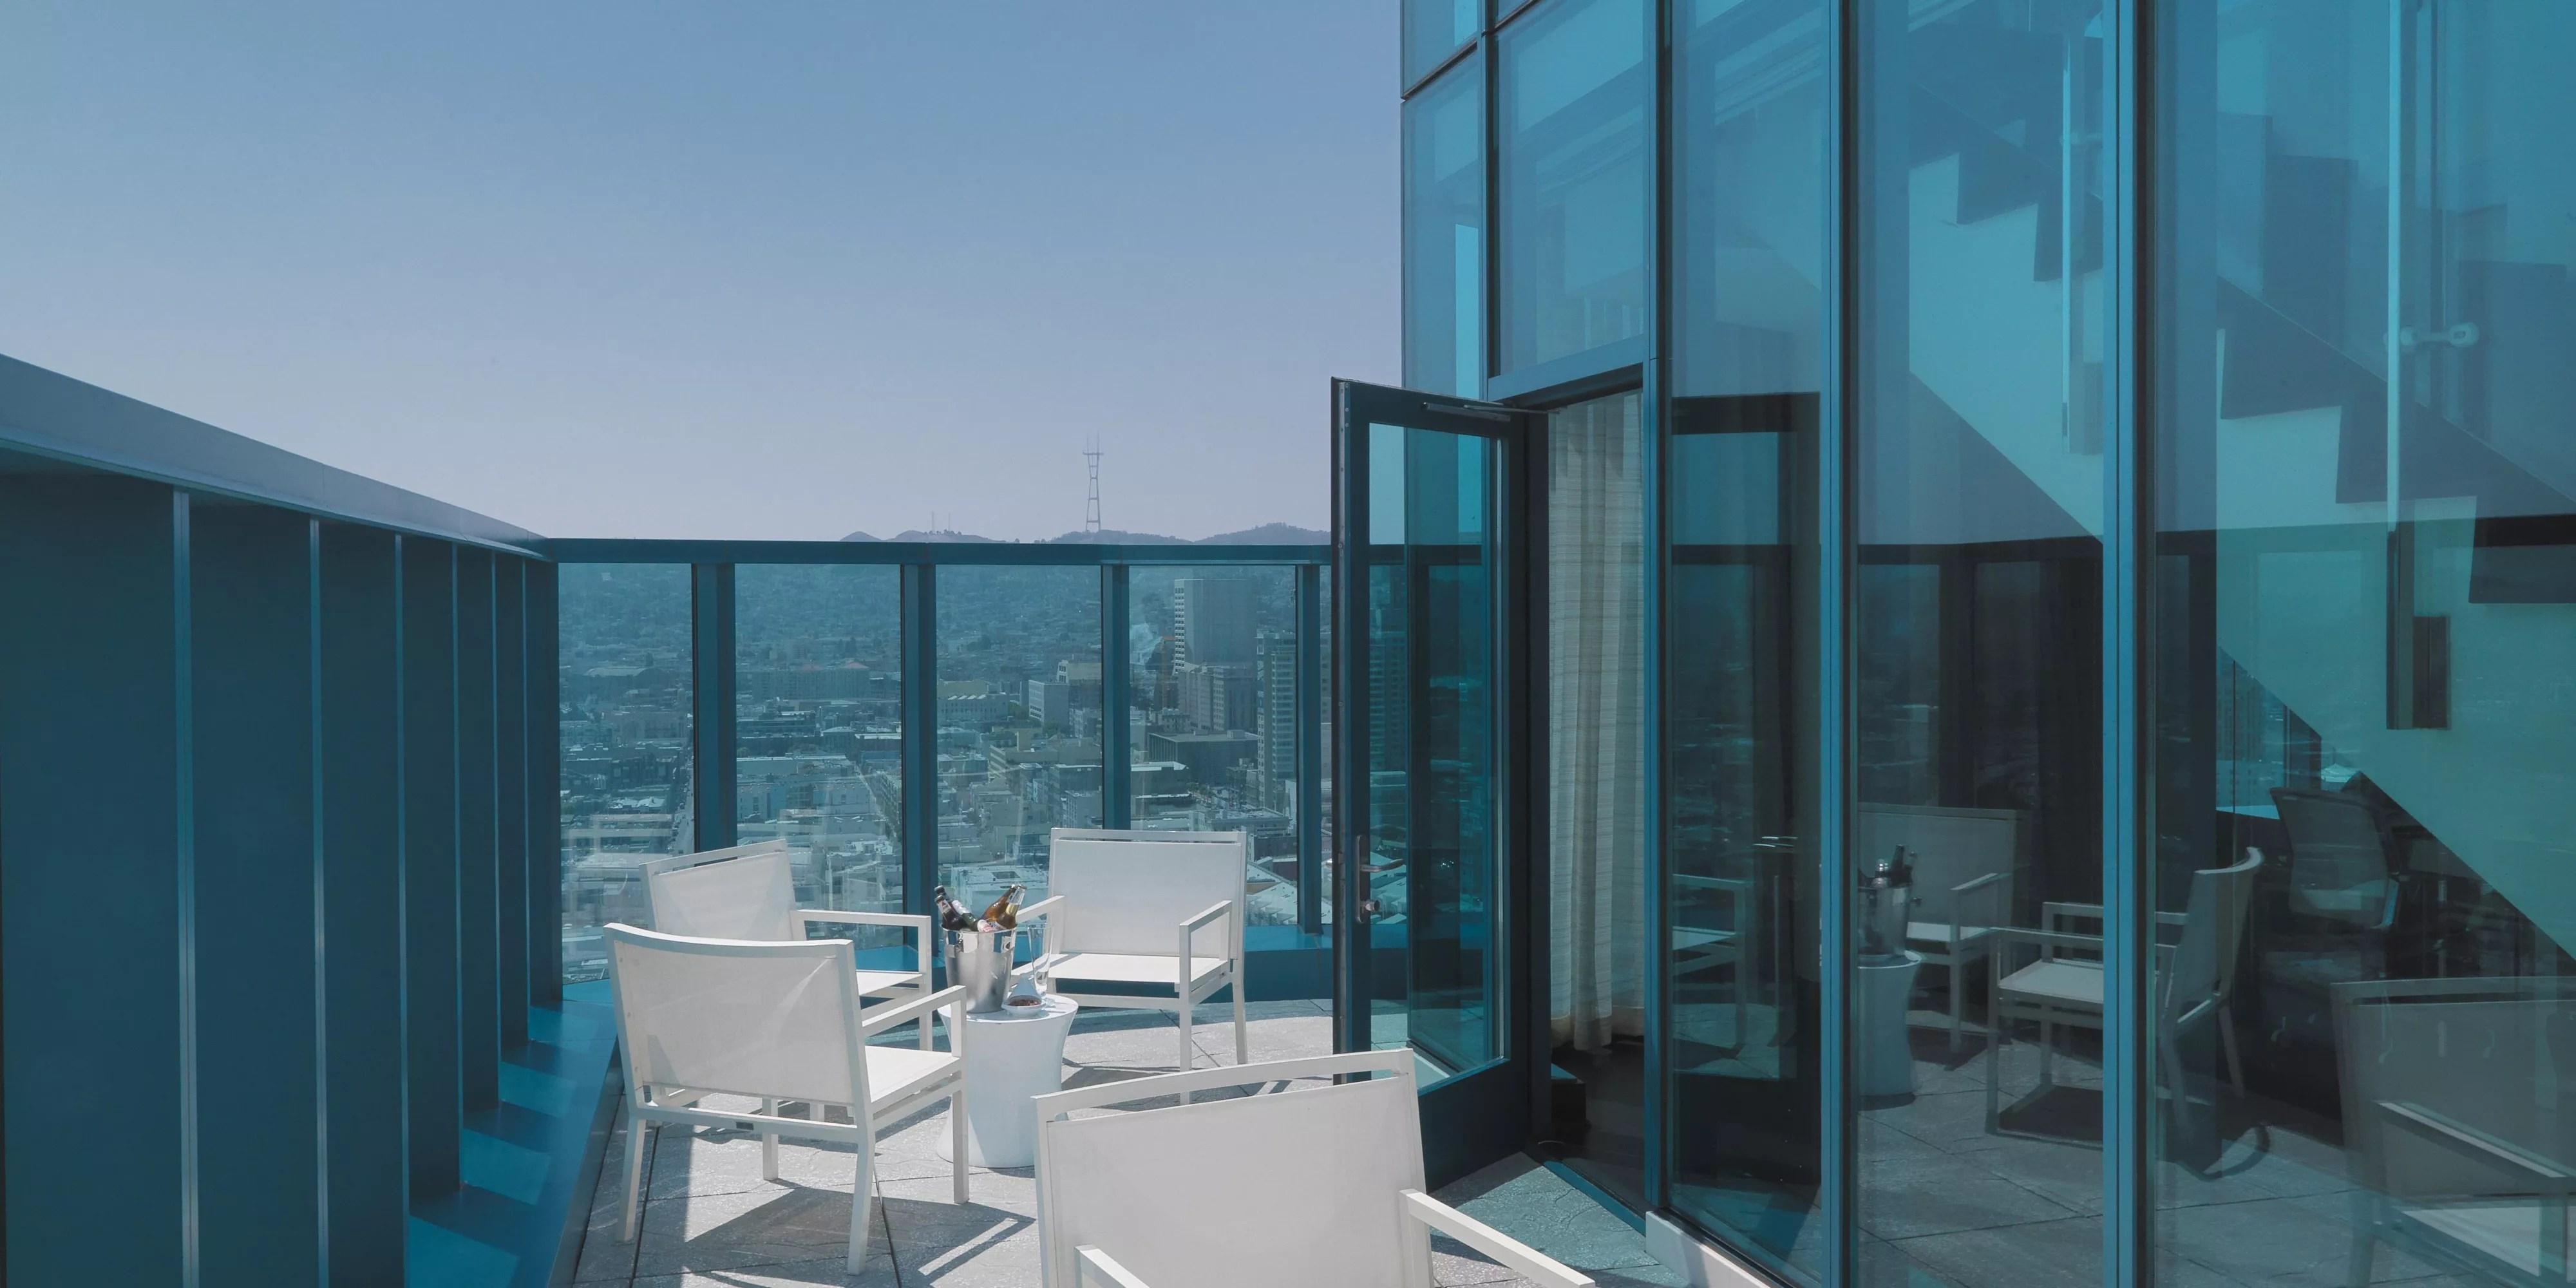 San Francisco Hotel Intercontinental 2018 World'